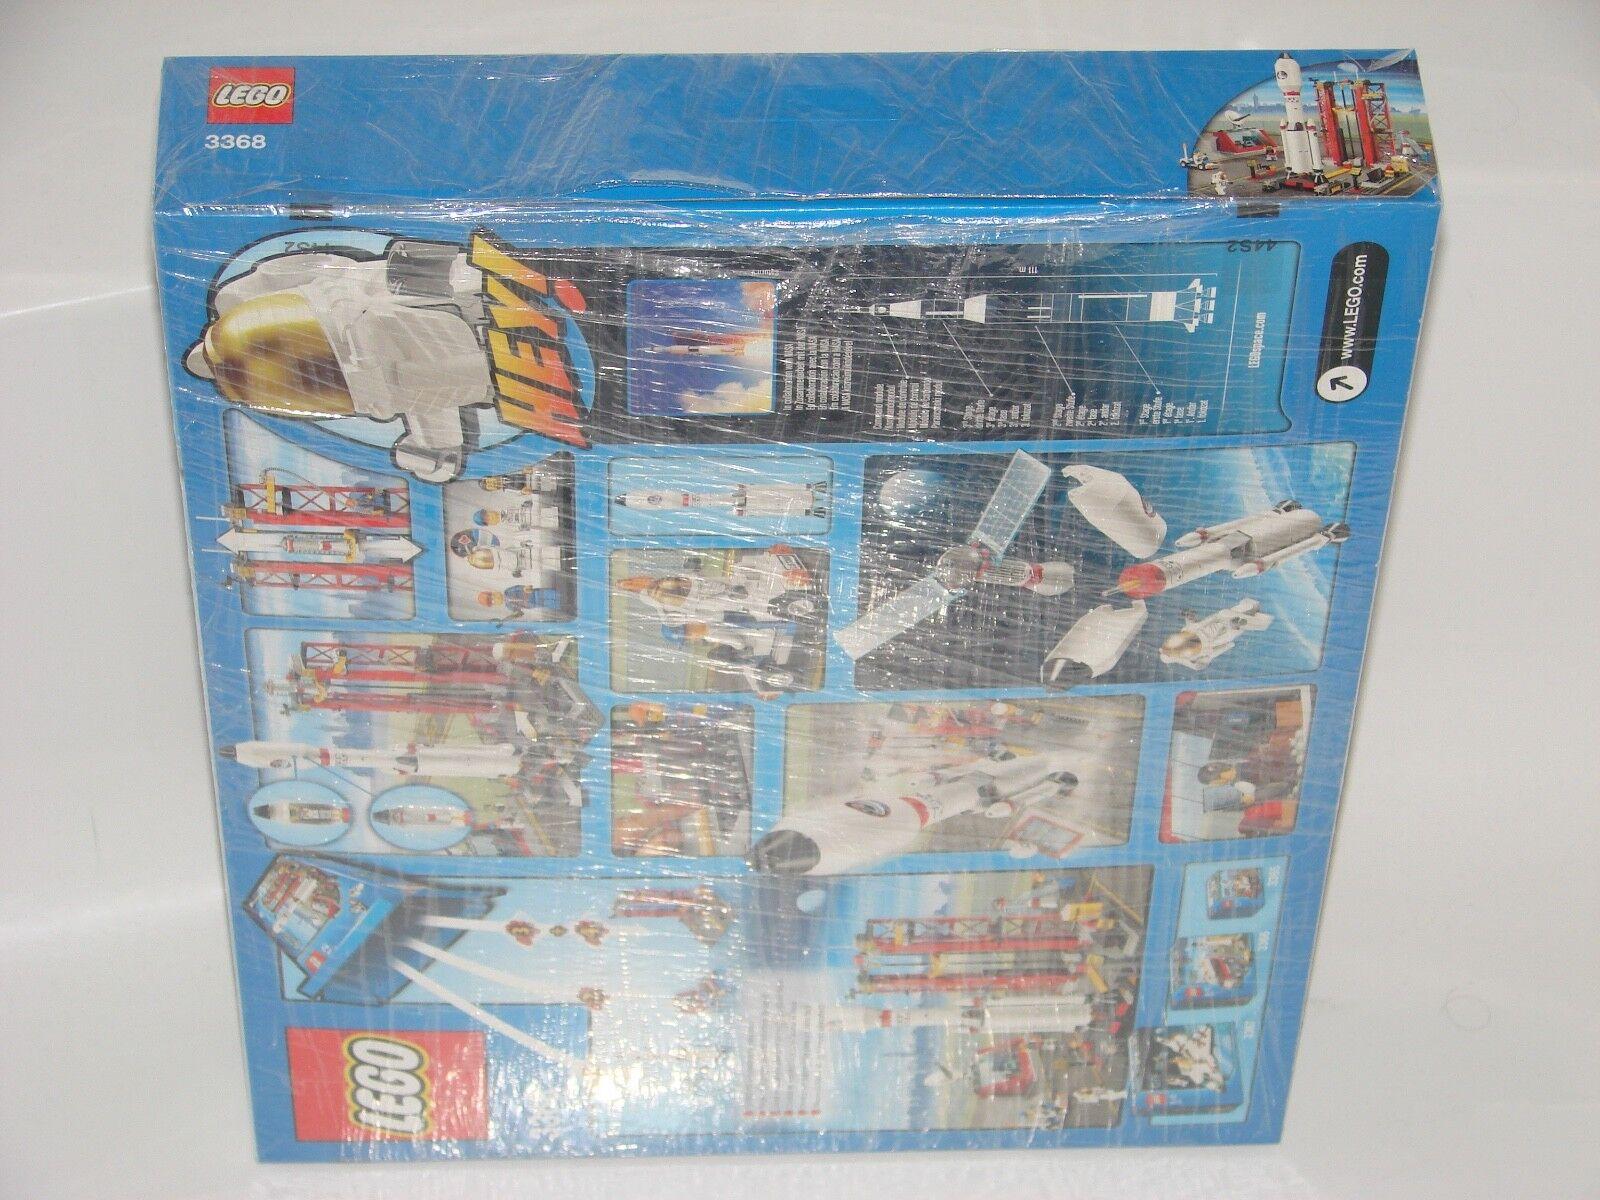 LEGO® City 3368 3368 3368 Raketenstation NEU_ SPACE Center NEW MIB NRFB_original pictures 3c0b21